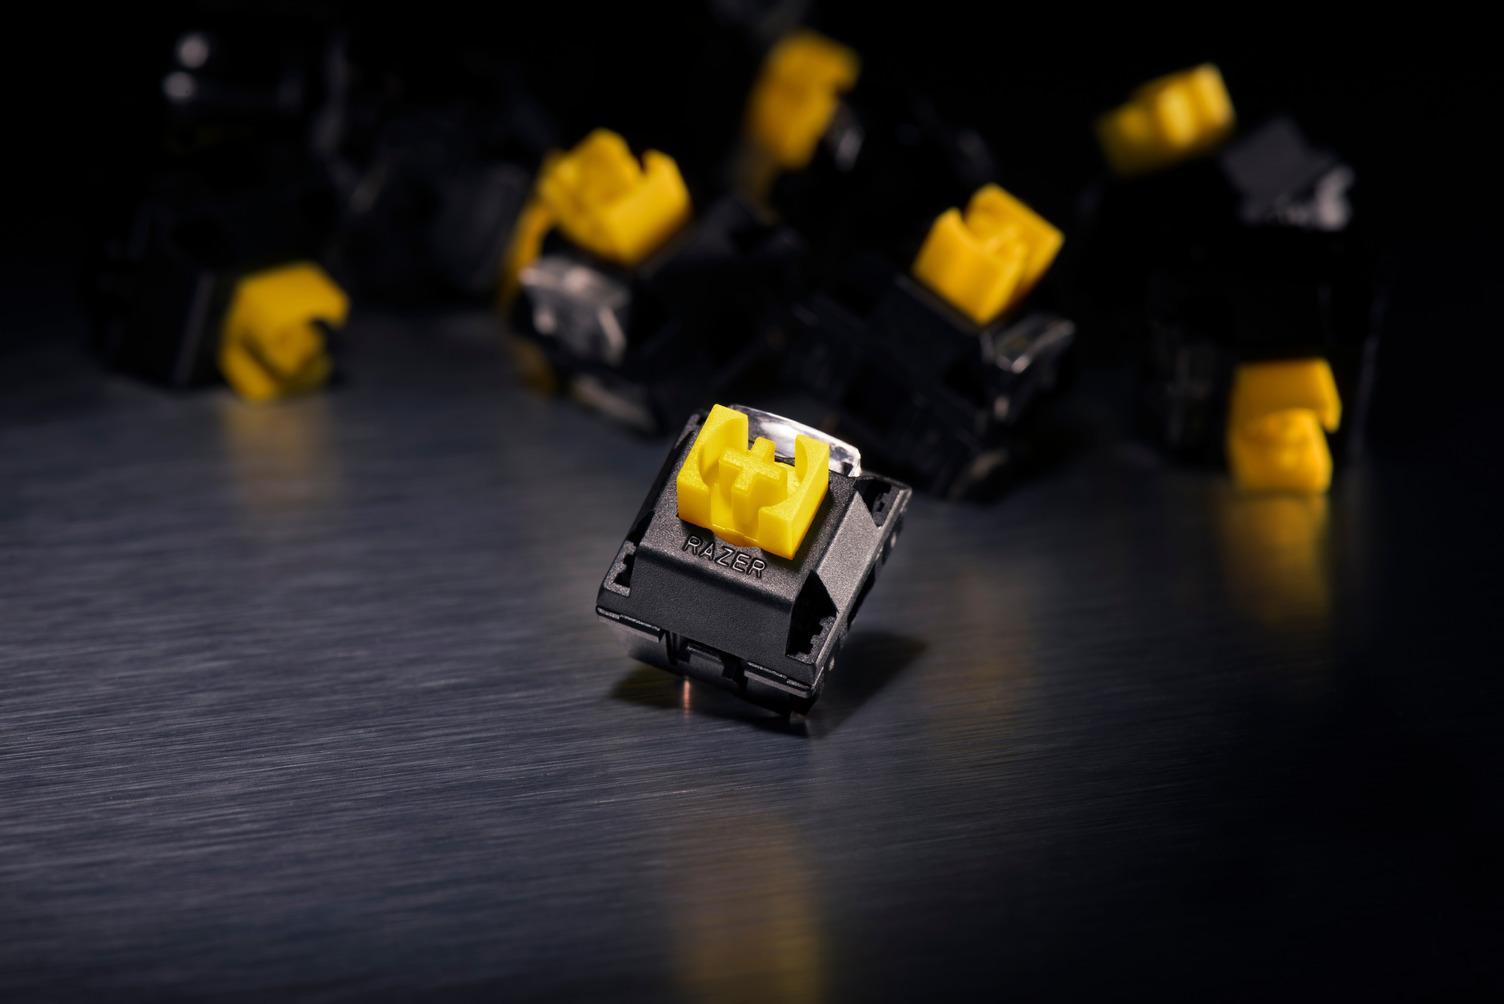 Razer BlackWidow Elite mechanical gaming keyboard detailed with on